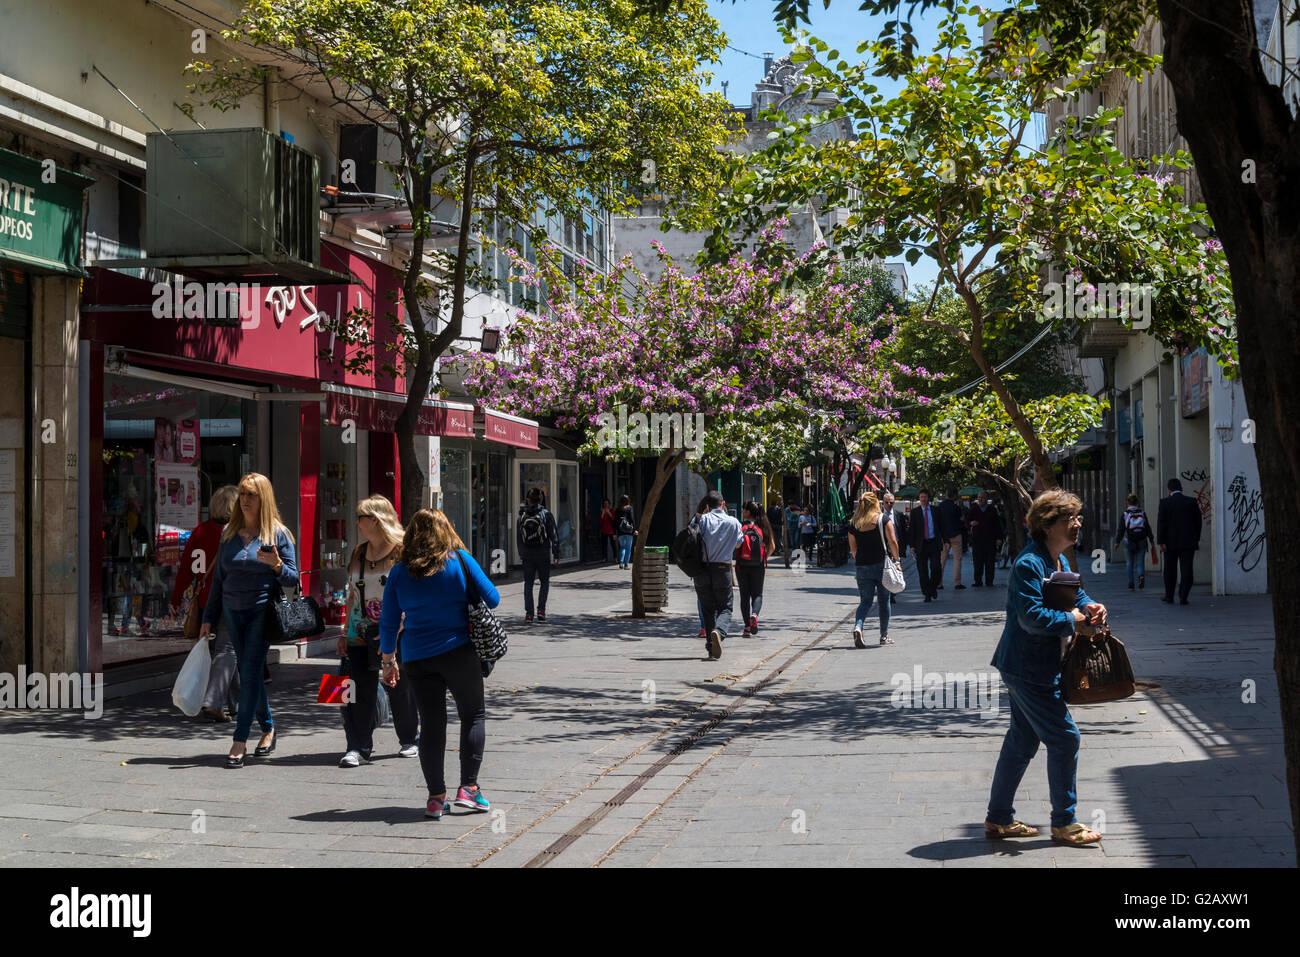 Pedestrianized  Avenida Cordoba, Rosario, Santa Fe province, Argentina - Stock Image